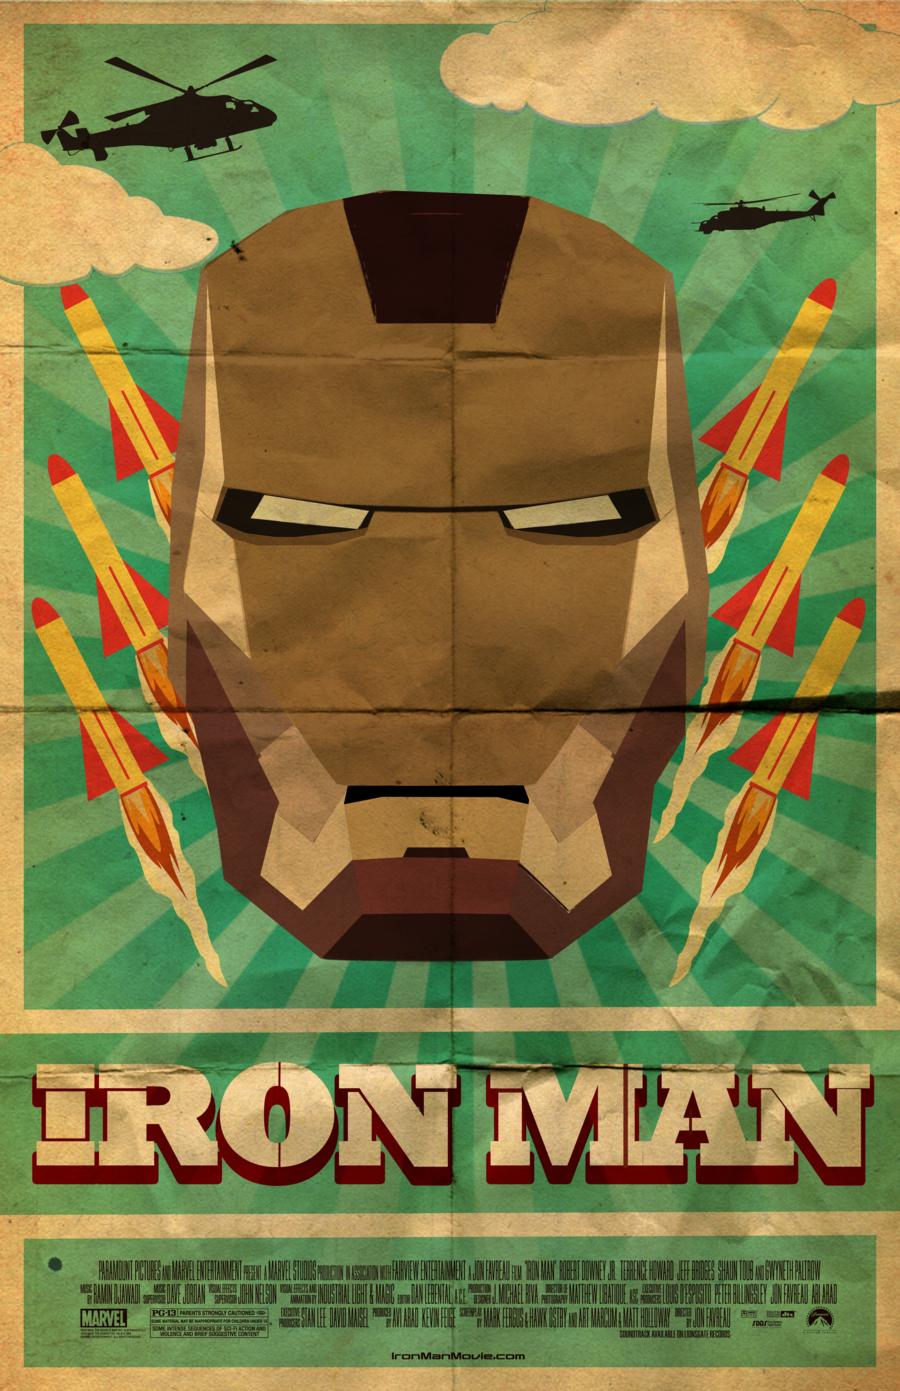 retro movie posters - Google Search | Alt Movie Posters ...